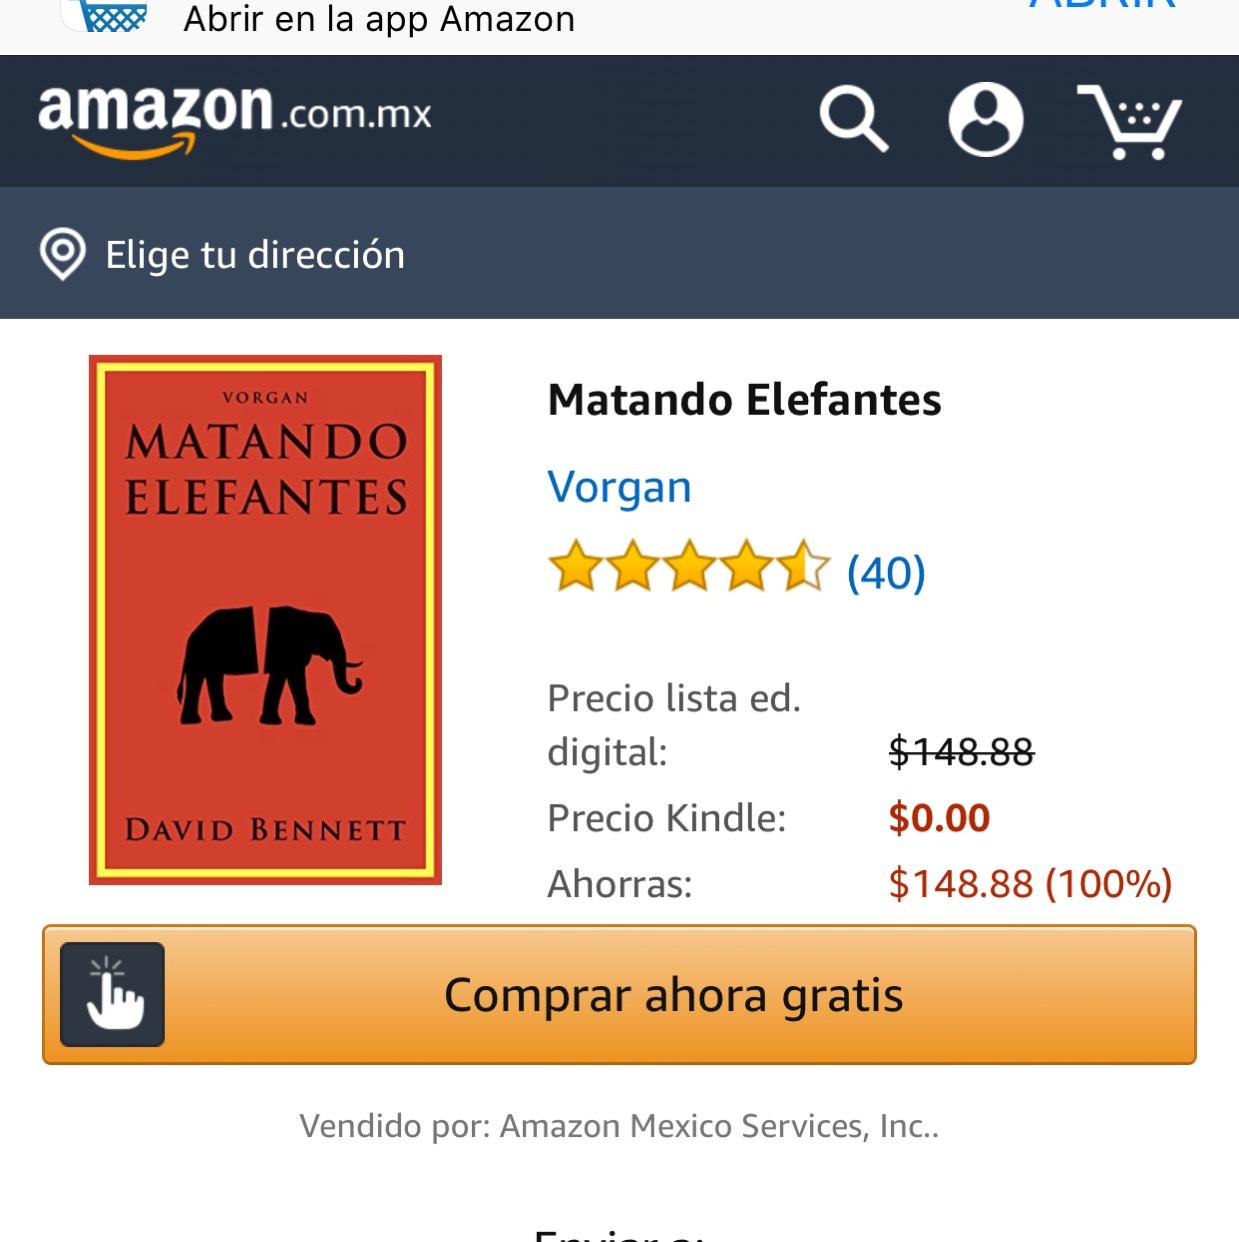 Amazon: Matando Elefantes Gratis